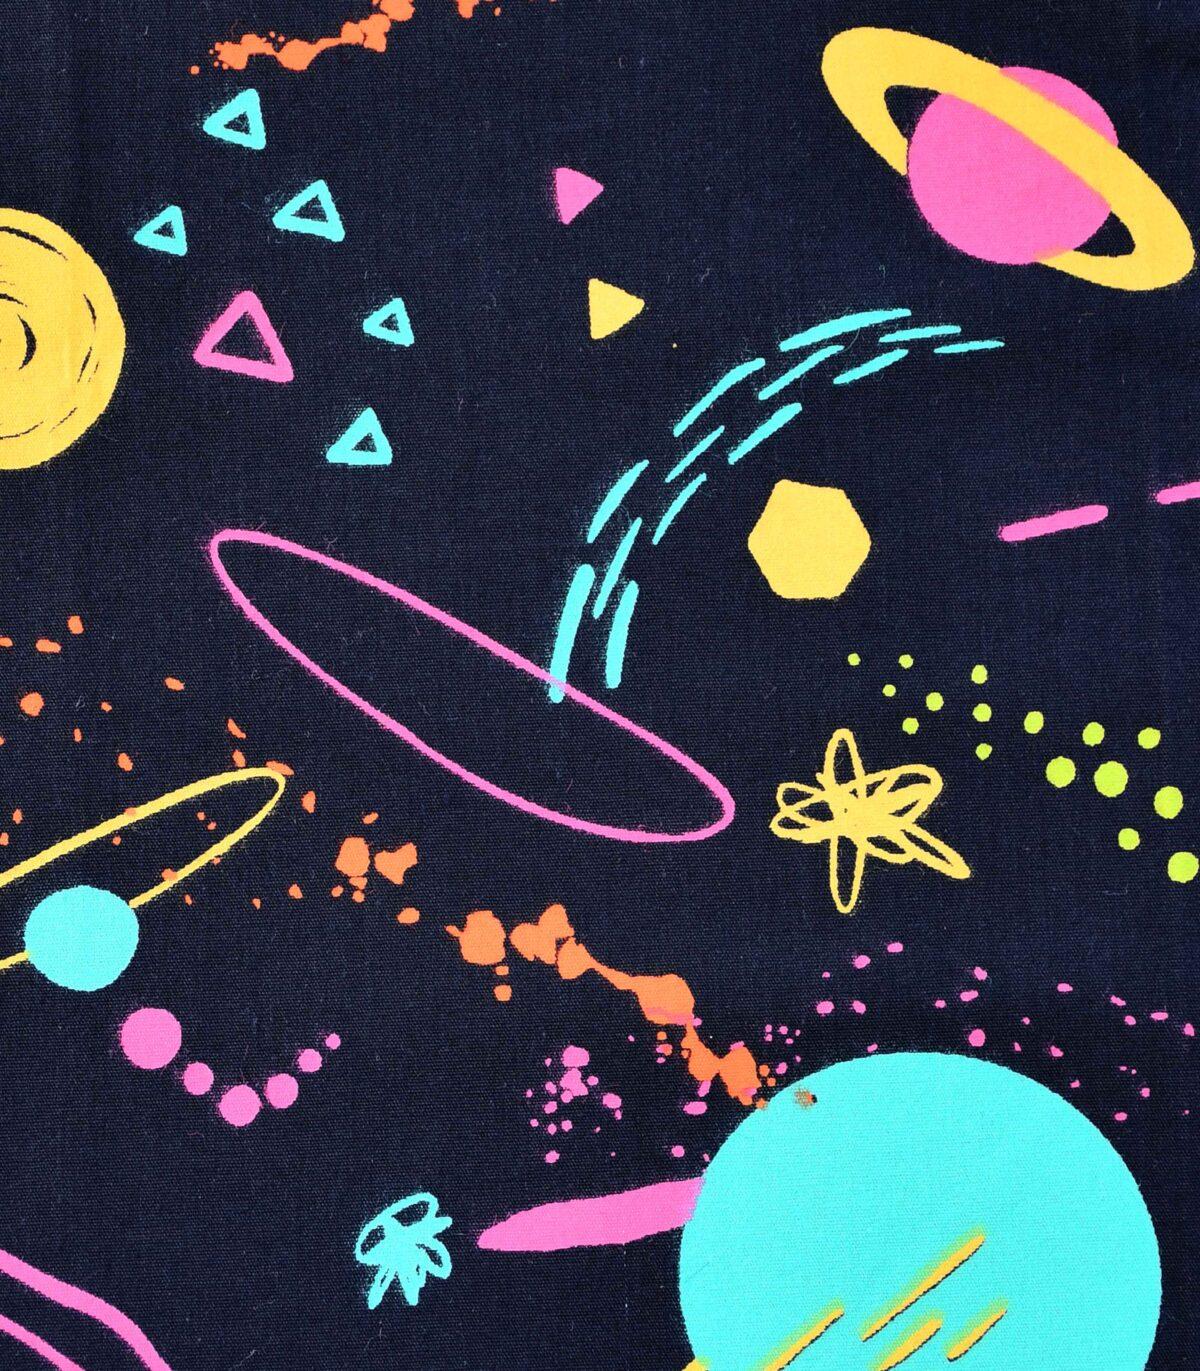 Cotton Black Base Galaxy Print Fabric